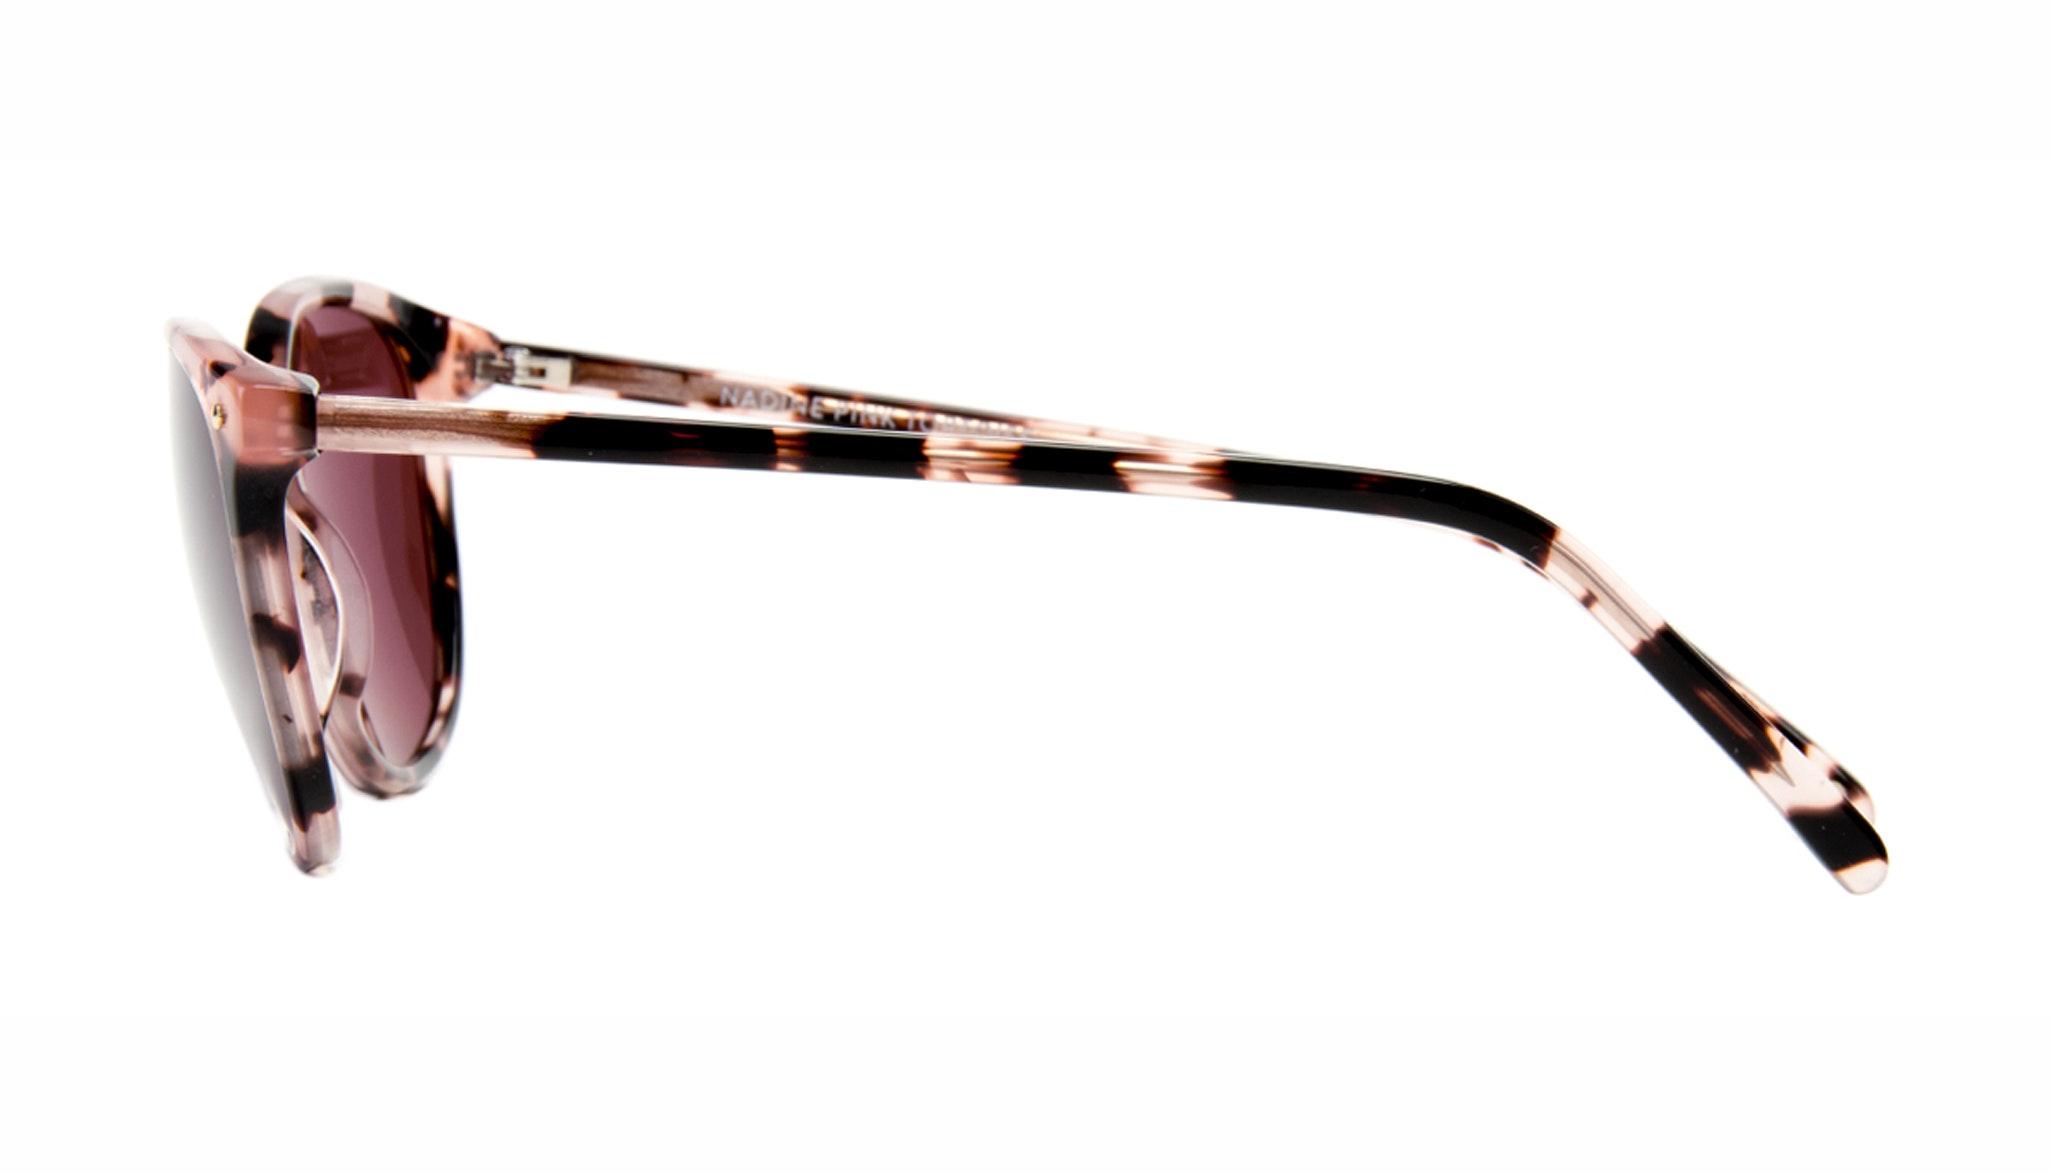 Affordable Fashion Glasses Rectangle Square Round Sunglasses Women Nadine Pink Tortoise Side